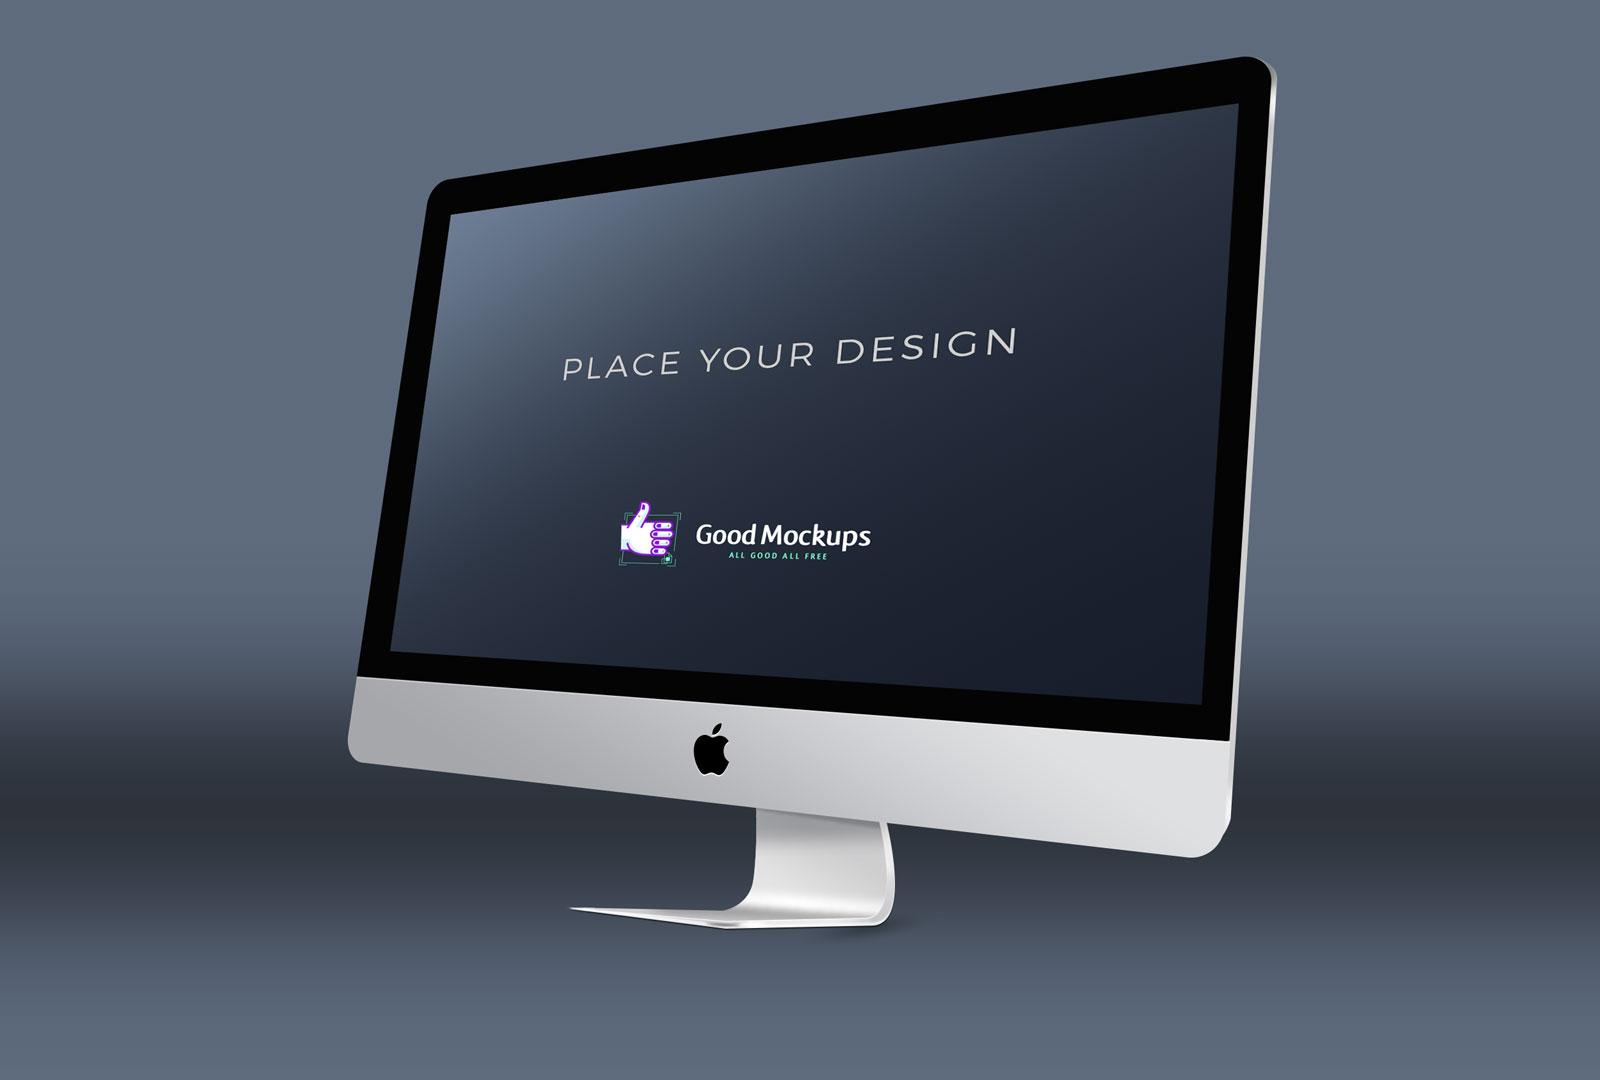 4 Premium Free Apple IMac Mockup PSD Templates Good Mockups